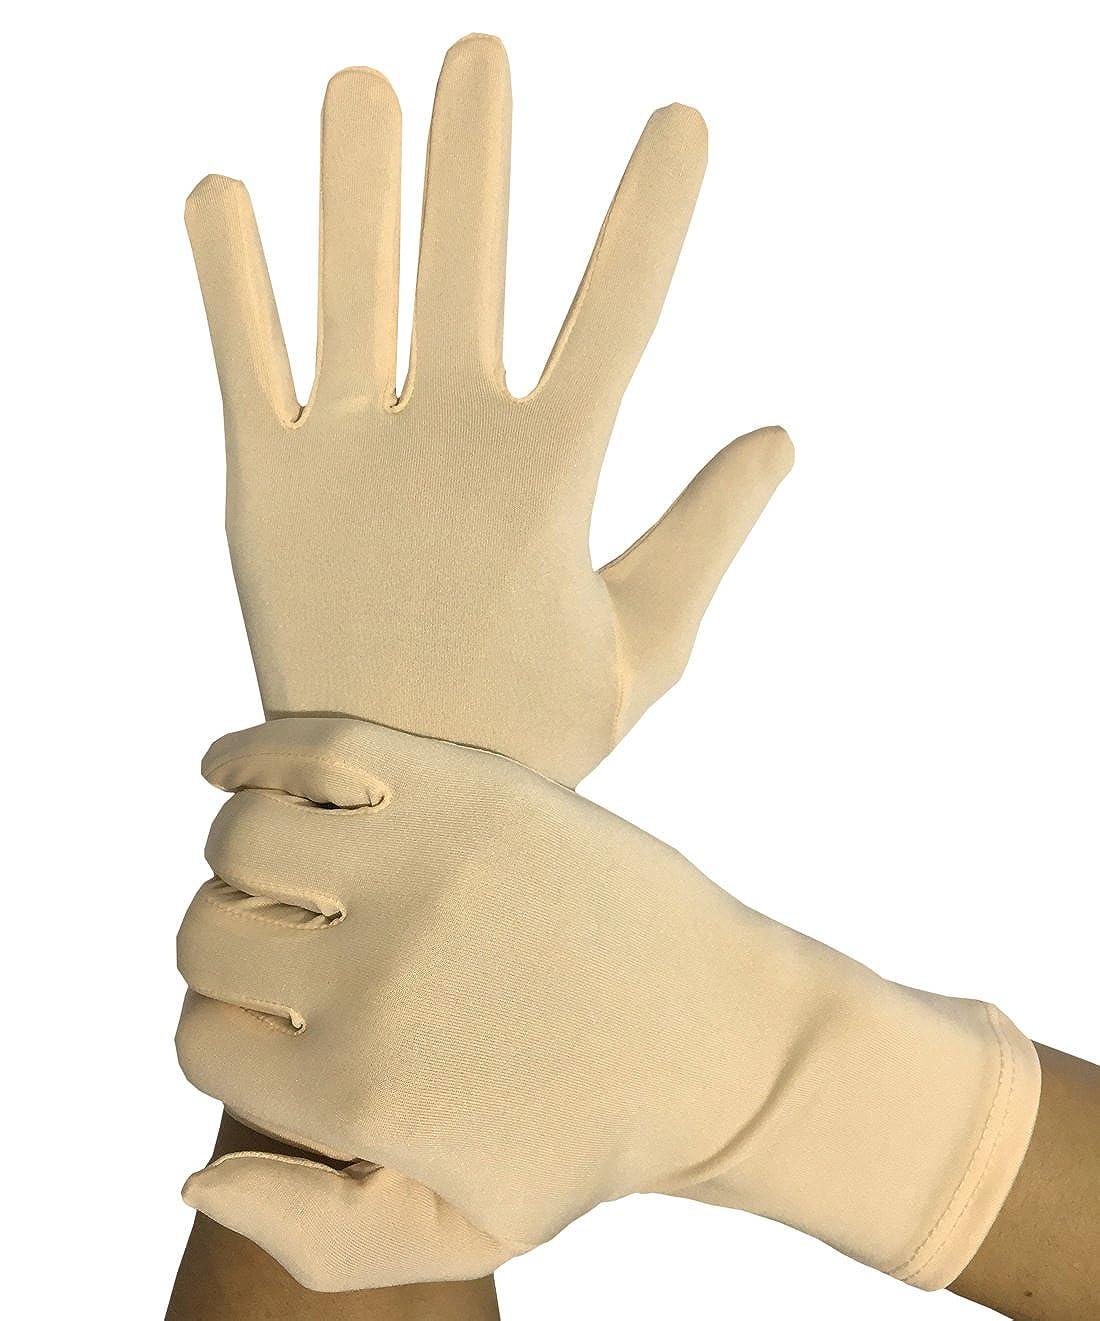 Amazon.com: Seeksmile Adult Lycra Spandex Gloves (Free Size, Beige):  Clothing